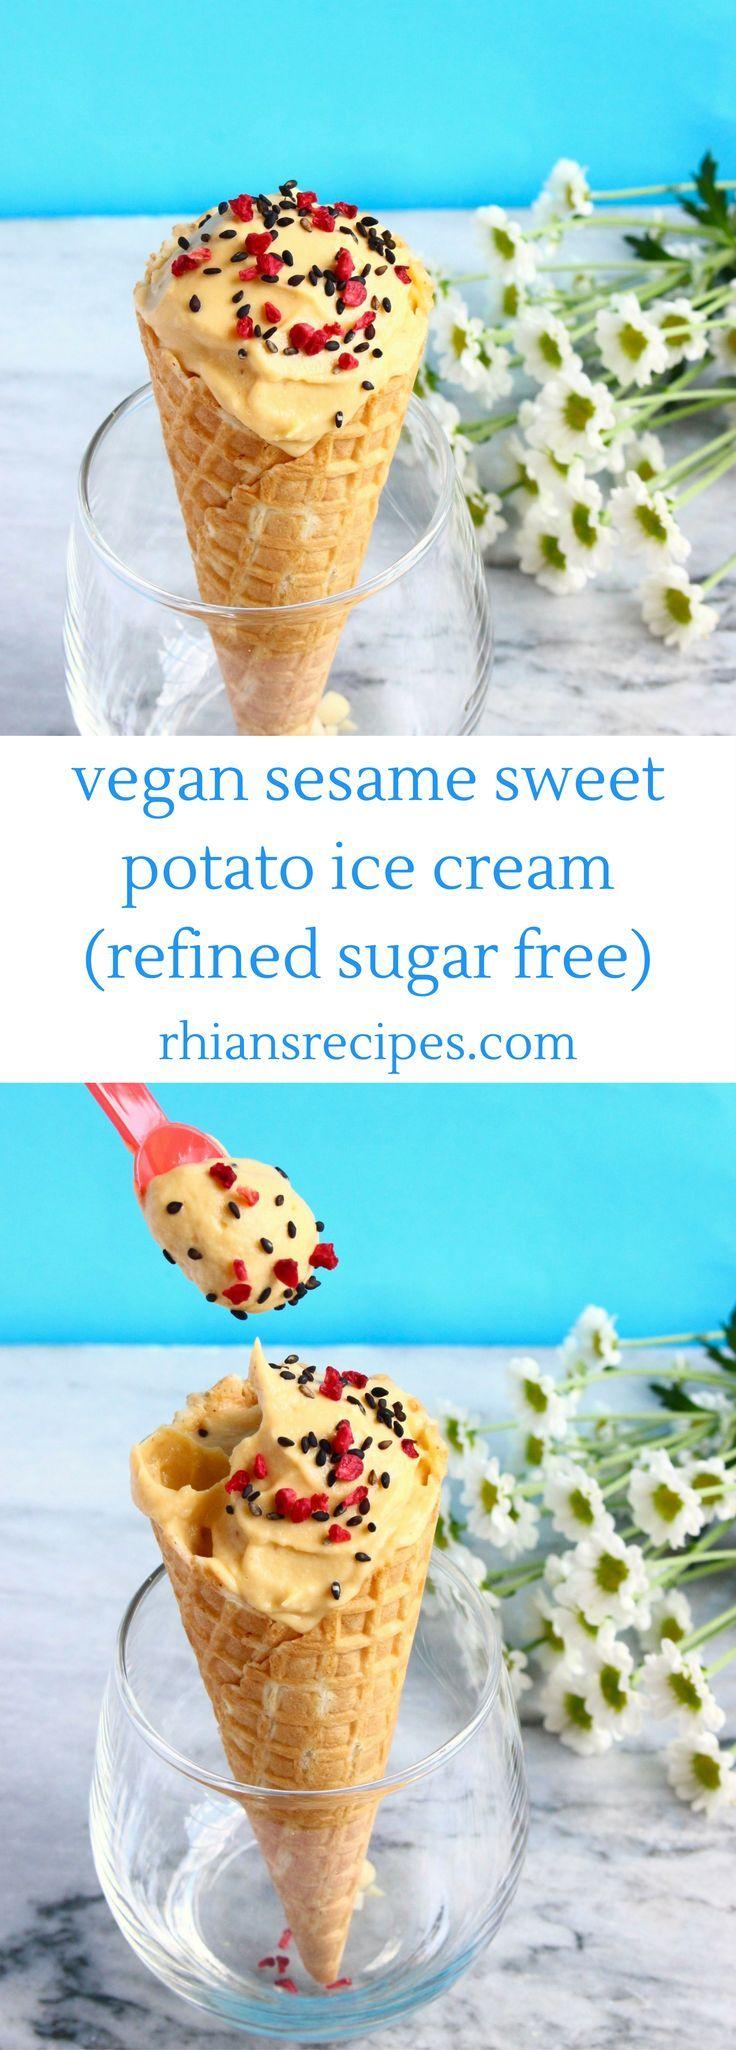 3-ingredient Vegan Sesame Sweet Potato Ice Cream - refined sugar free, gluten-free, nut-free, no ice cream maker required!